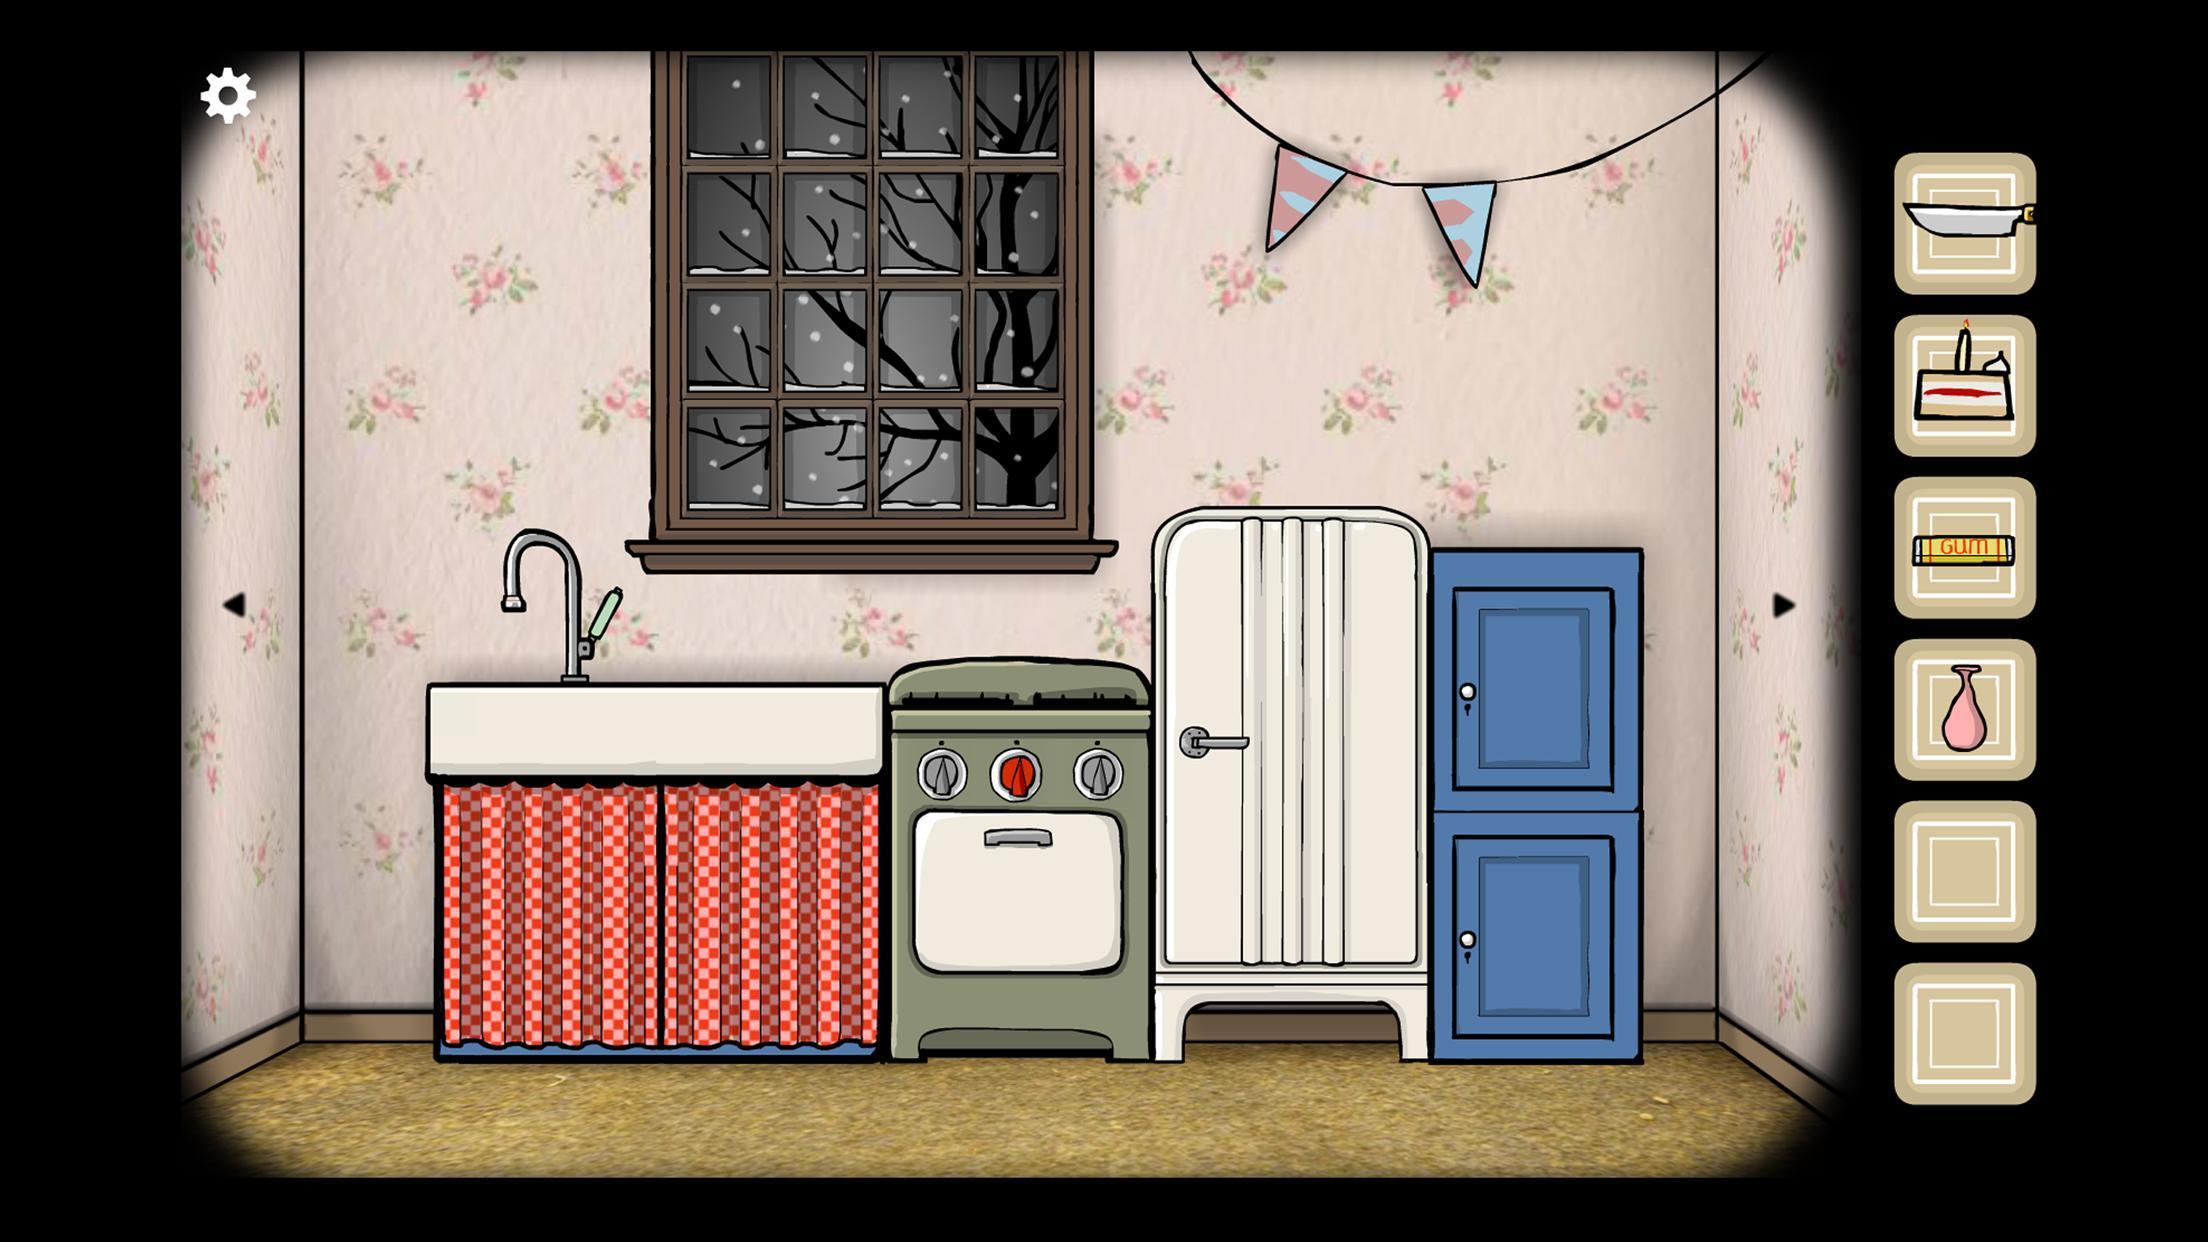 Cube Escape: Birthday 2.1.1 Screenshot 4